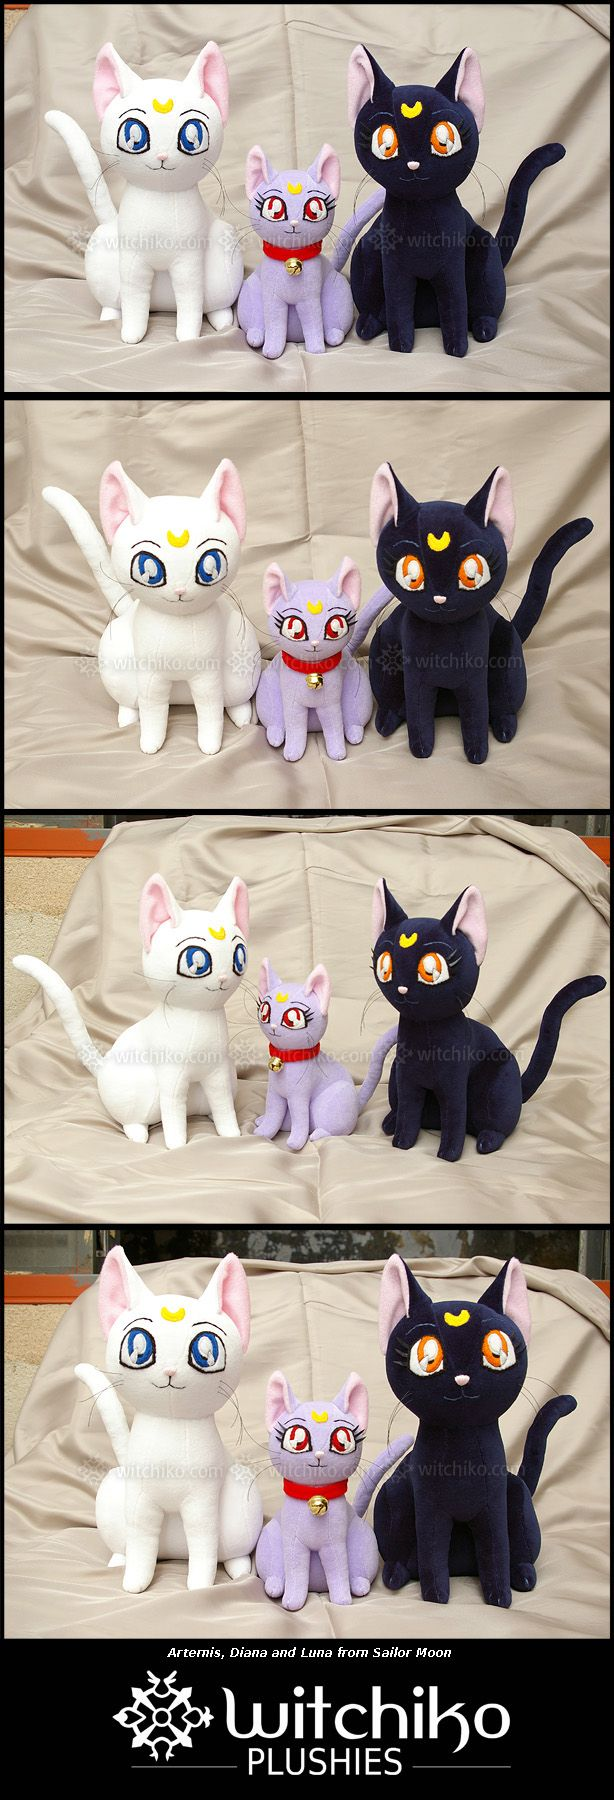 Artemis:::Diana:::Luna from Sailor Moon by Witchiko.deviantart.com on @deviantART